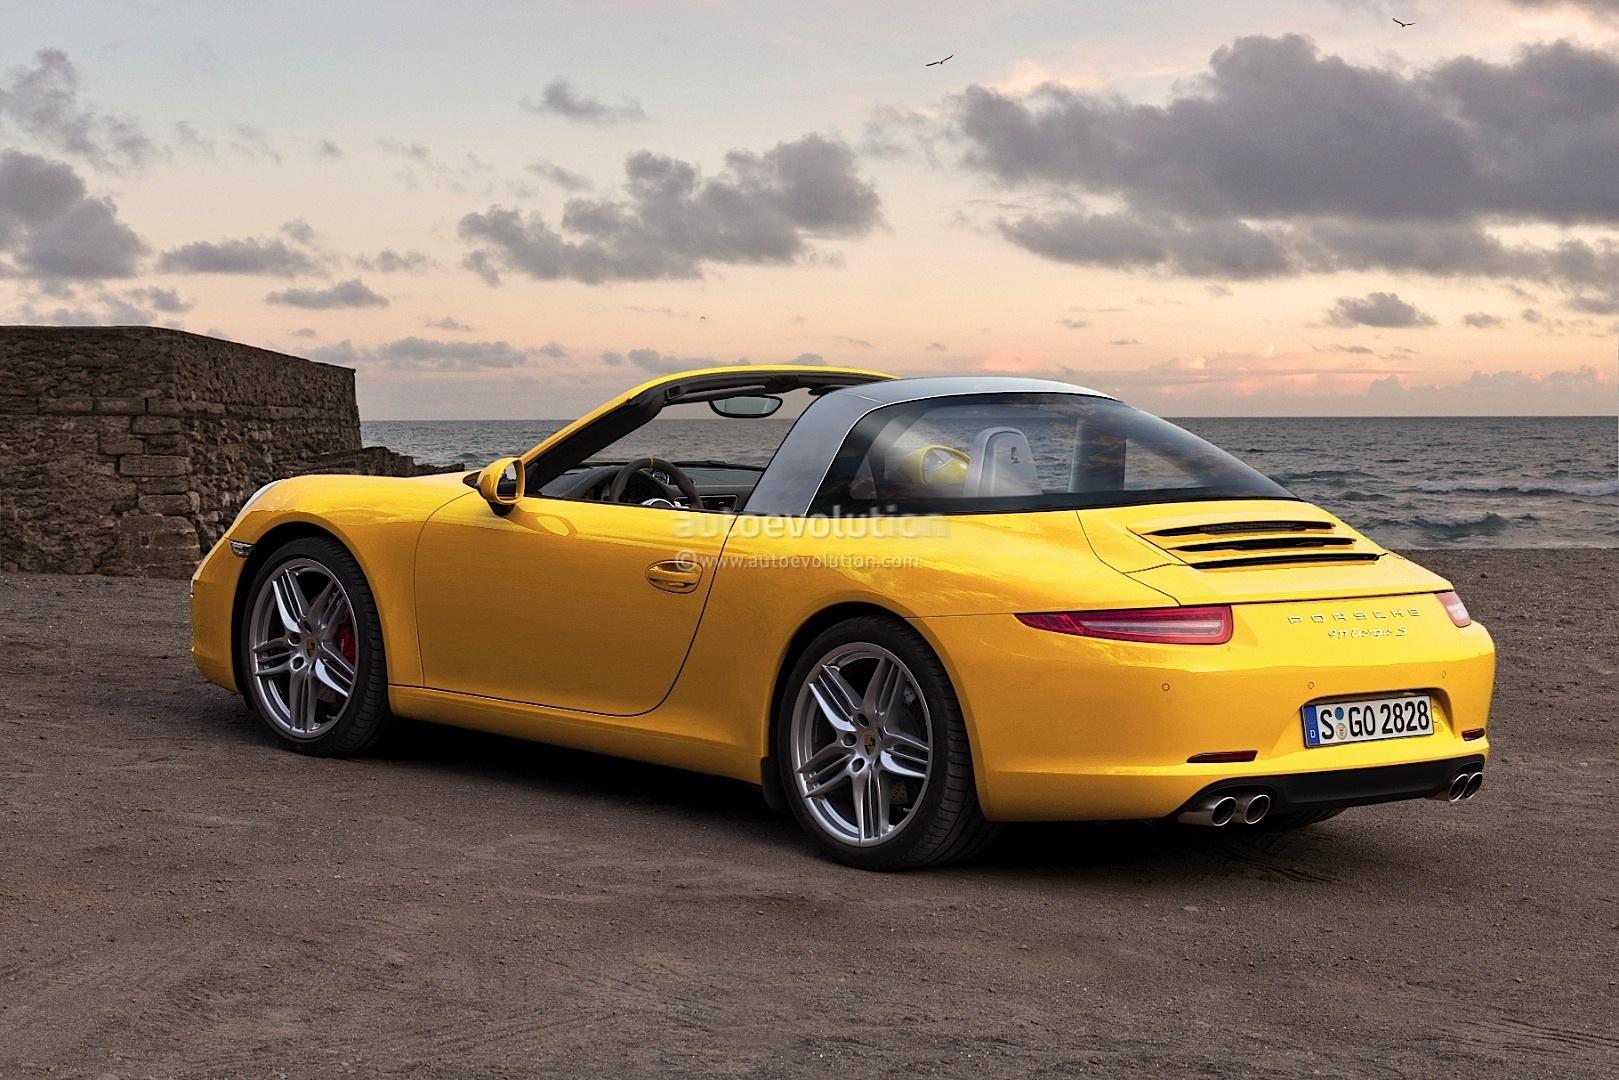 991 Targa Porsche-911-991-targa-rendered-into-reality-51515_1